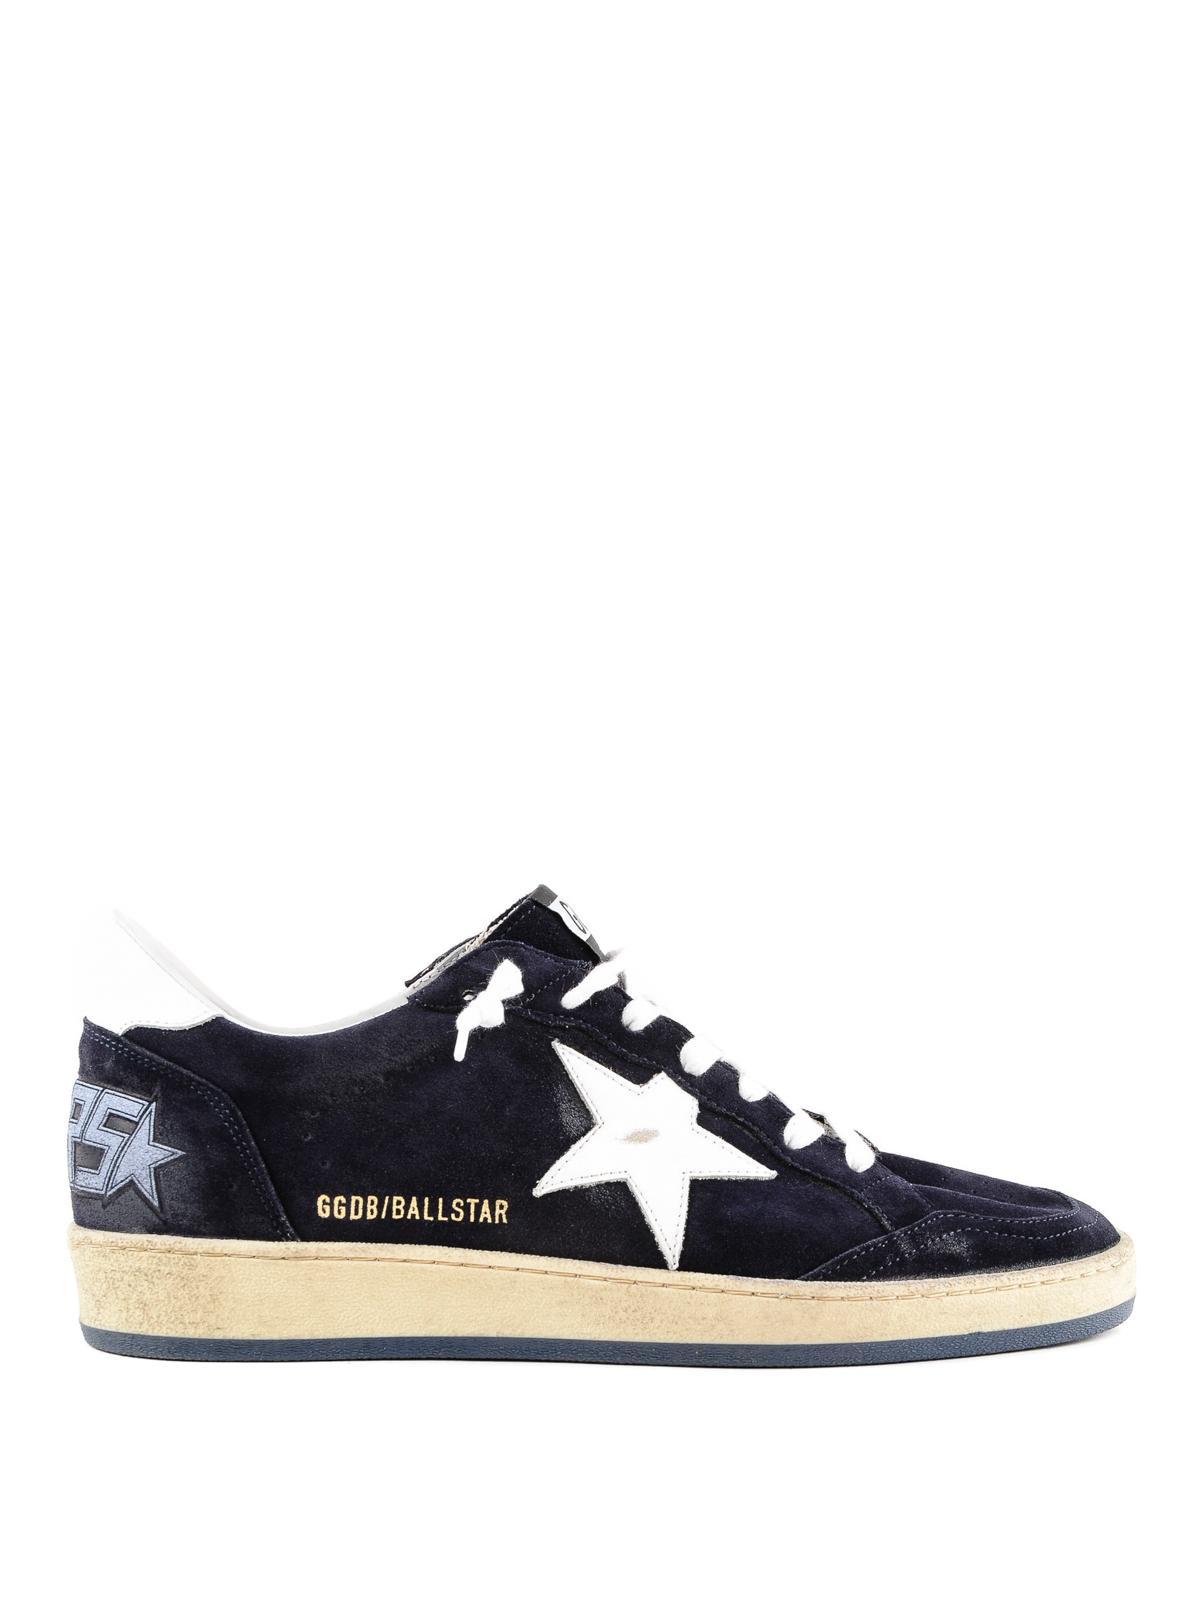 Golden Goose Ball Star navy suede sneakers trainers